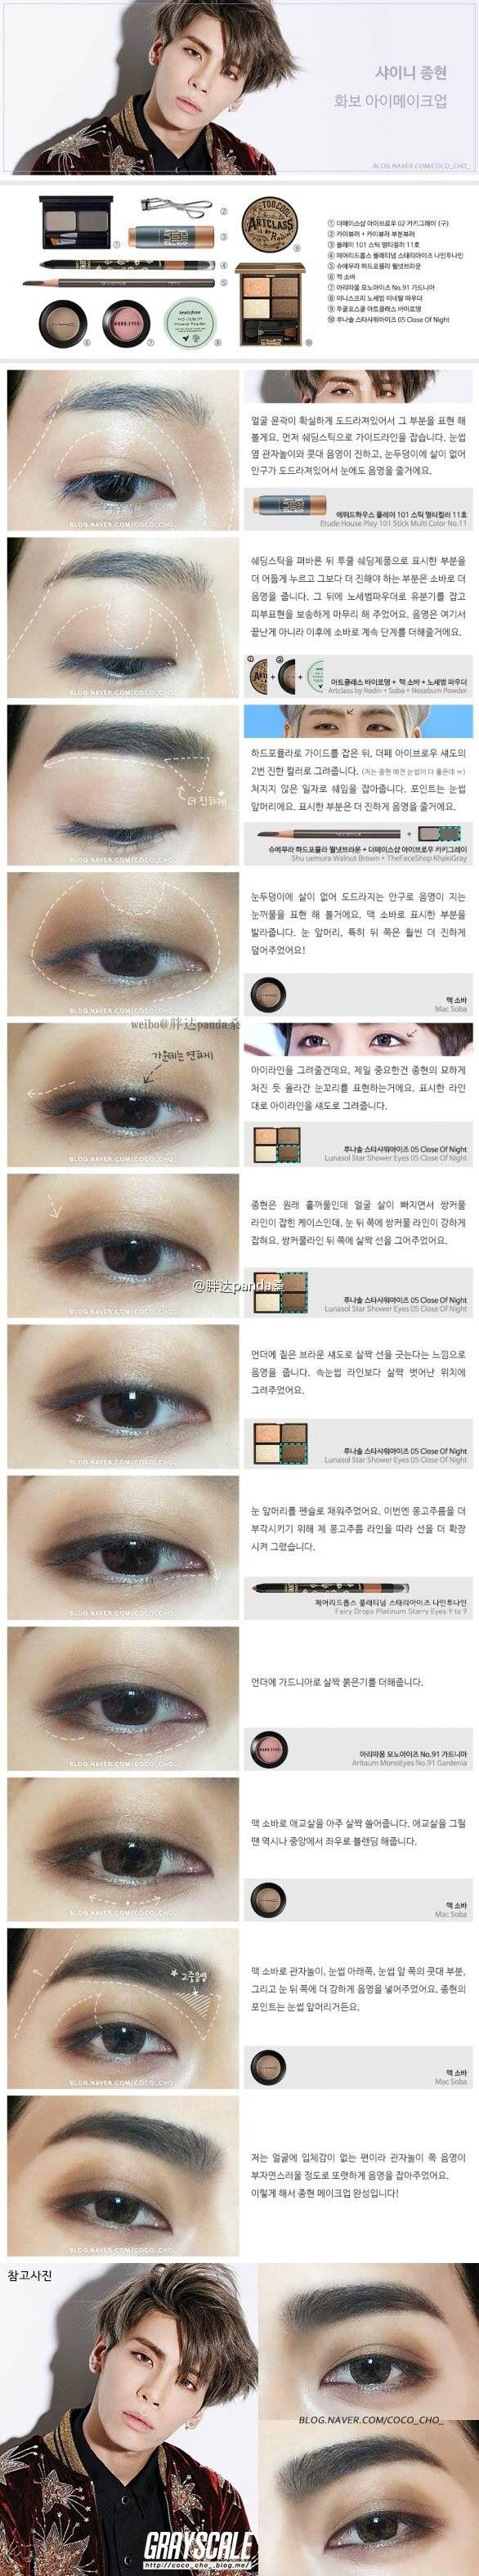 Shinee Jonghyun Korean Kpop Idol Makeup Tutorial Cr Coco Cho Blog Me Kpop Makeup Tutorial Korean Eye Makeup Eye Makeup